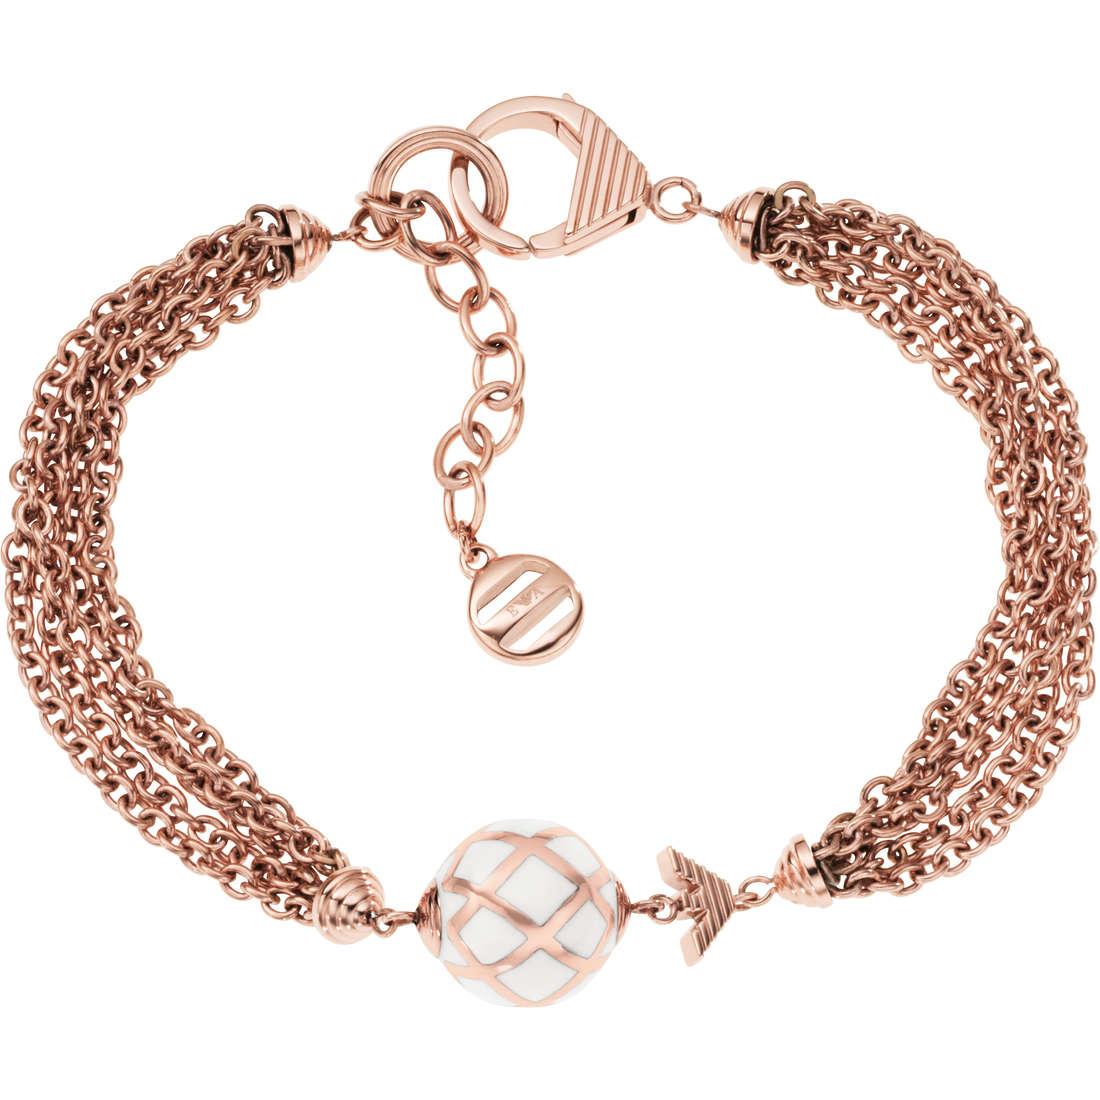 bracelet woman jewellery Emporio Armani EGS1678221